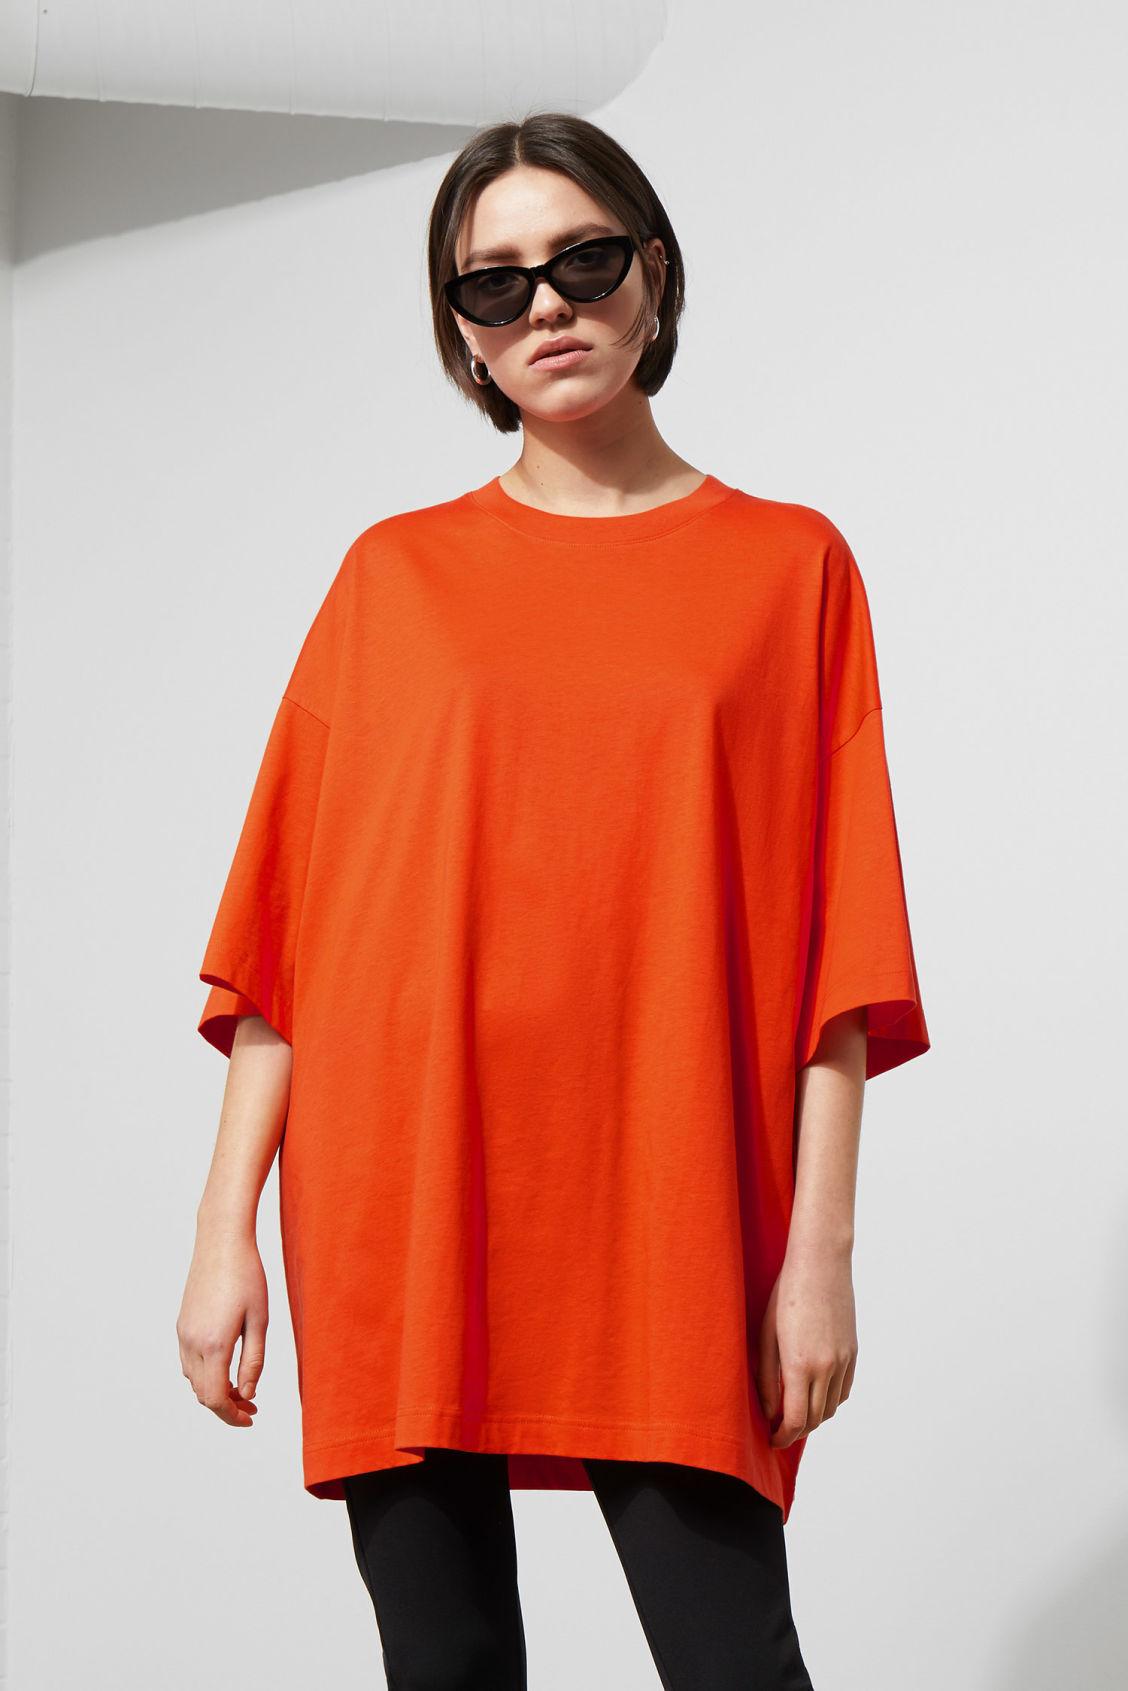 Huge T Shirt Dress Orange Dresses Jumpsuits Weekday